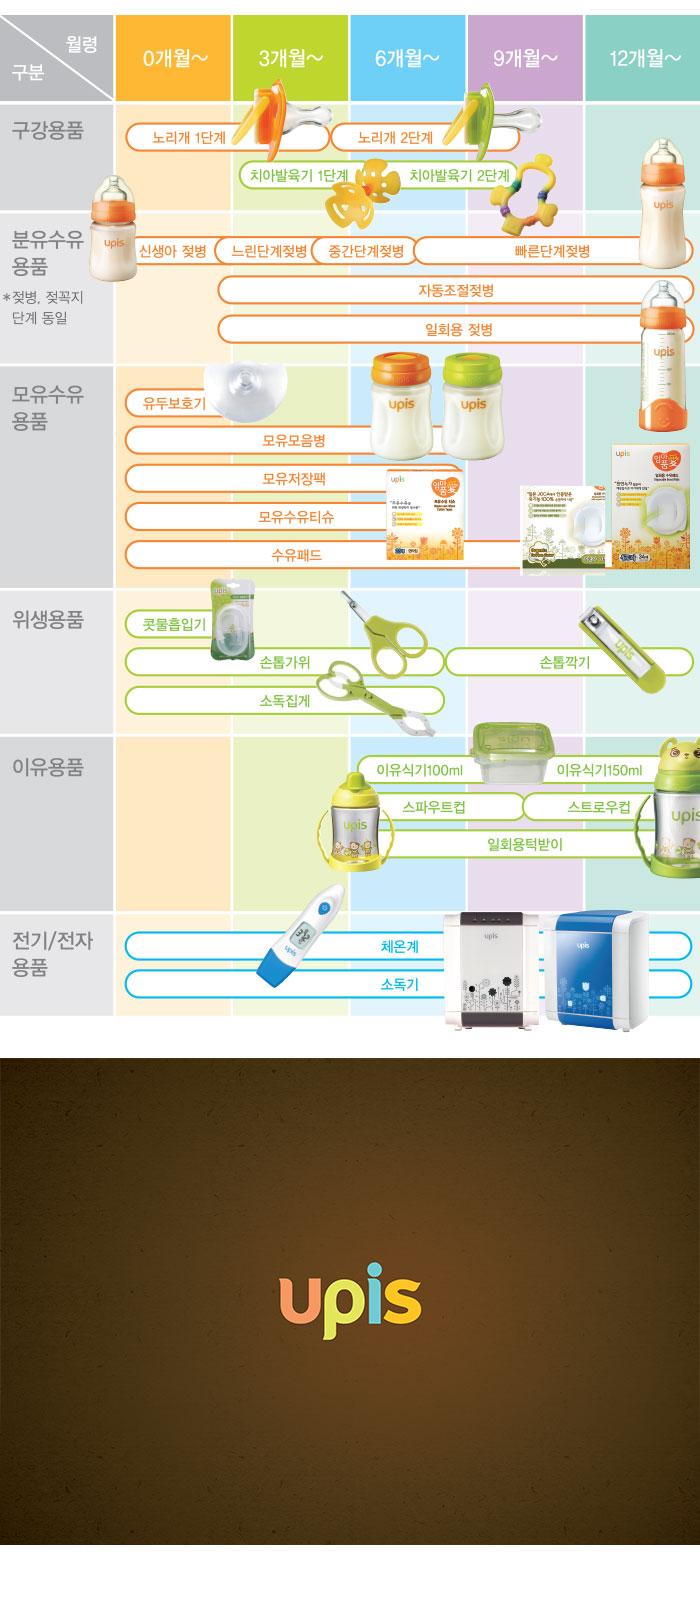 [ UPIS ] 步骤的磨牙环步骤2